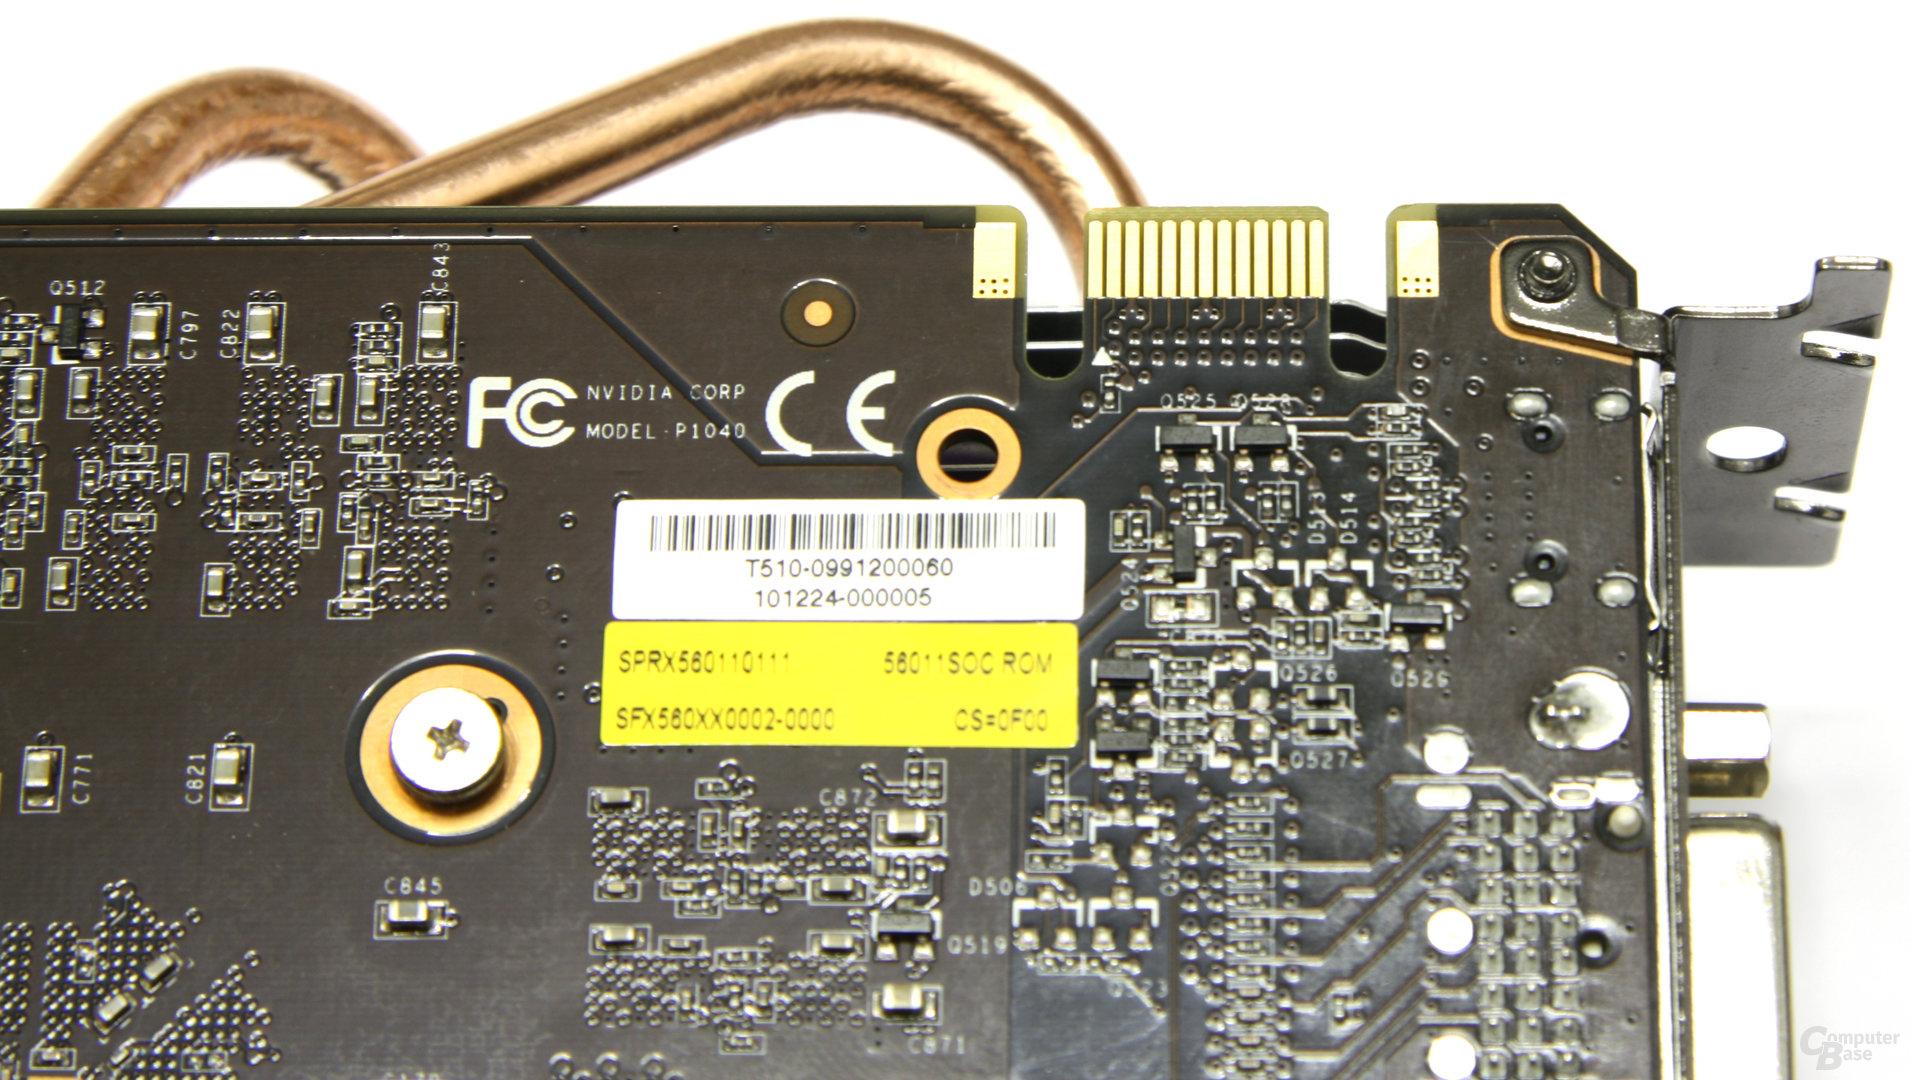 Calibre GTX 560 Super OC SLI-Anschluss